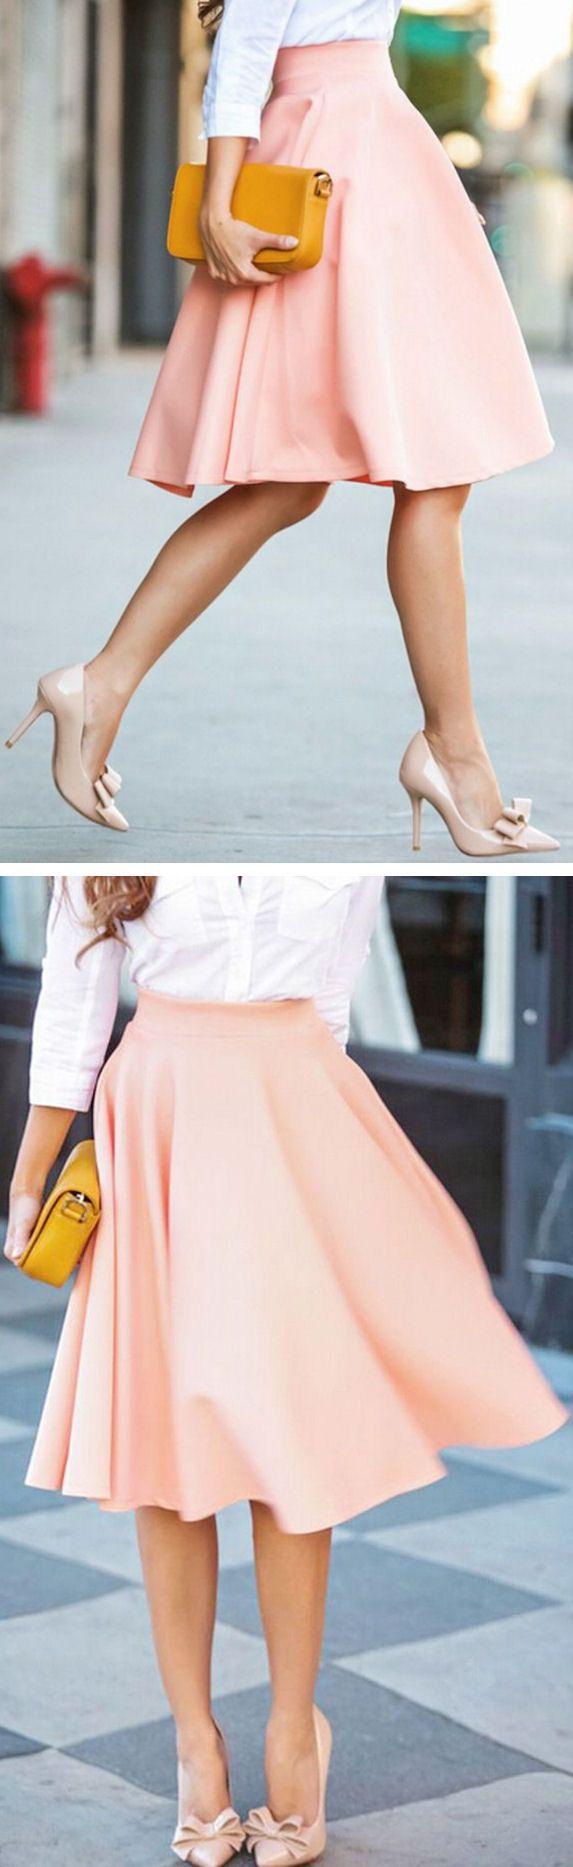 Light pink skirt, white shirt, nude heels.